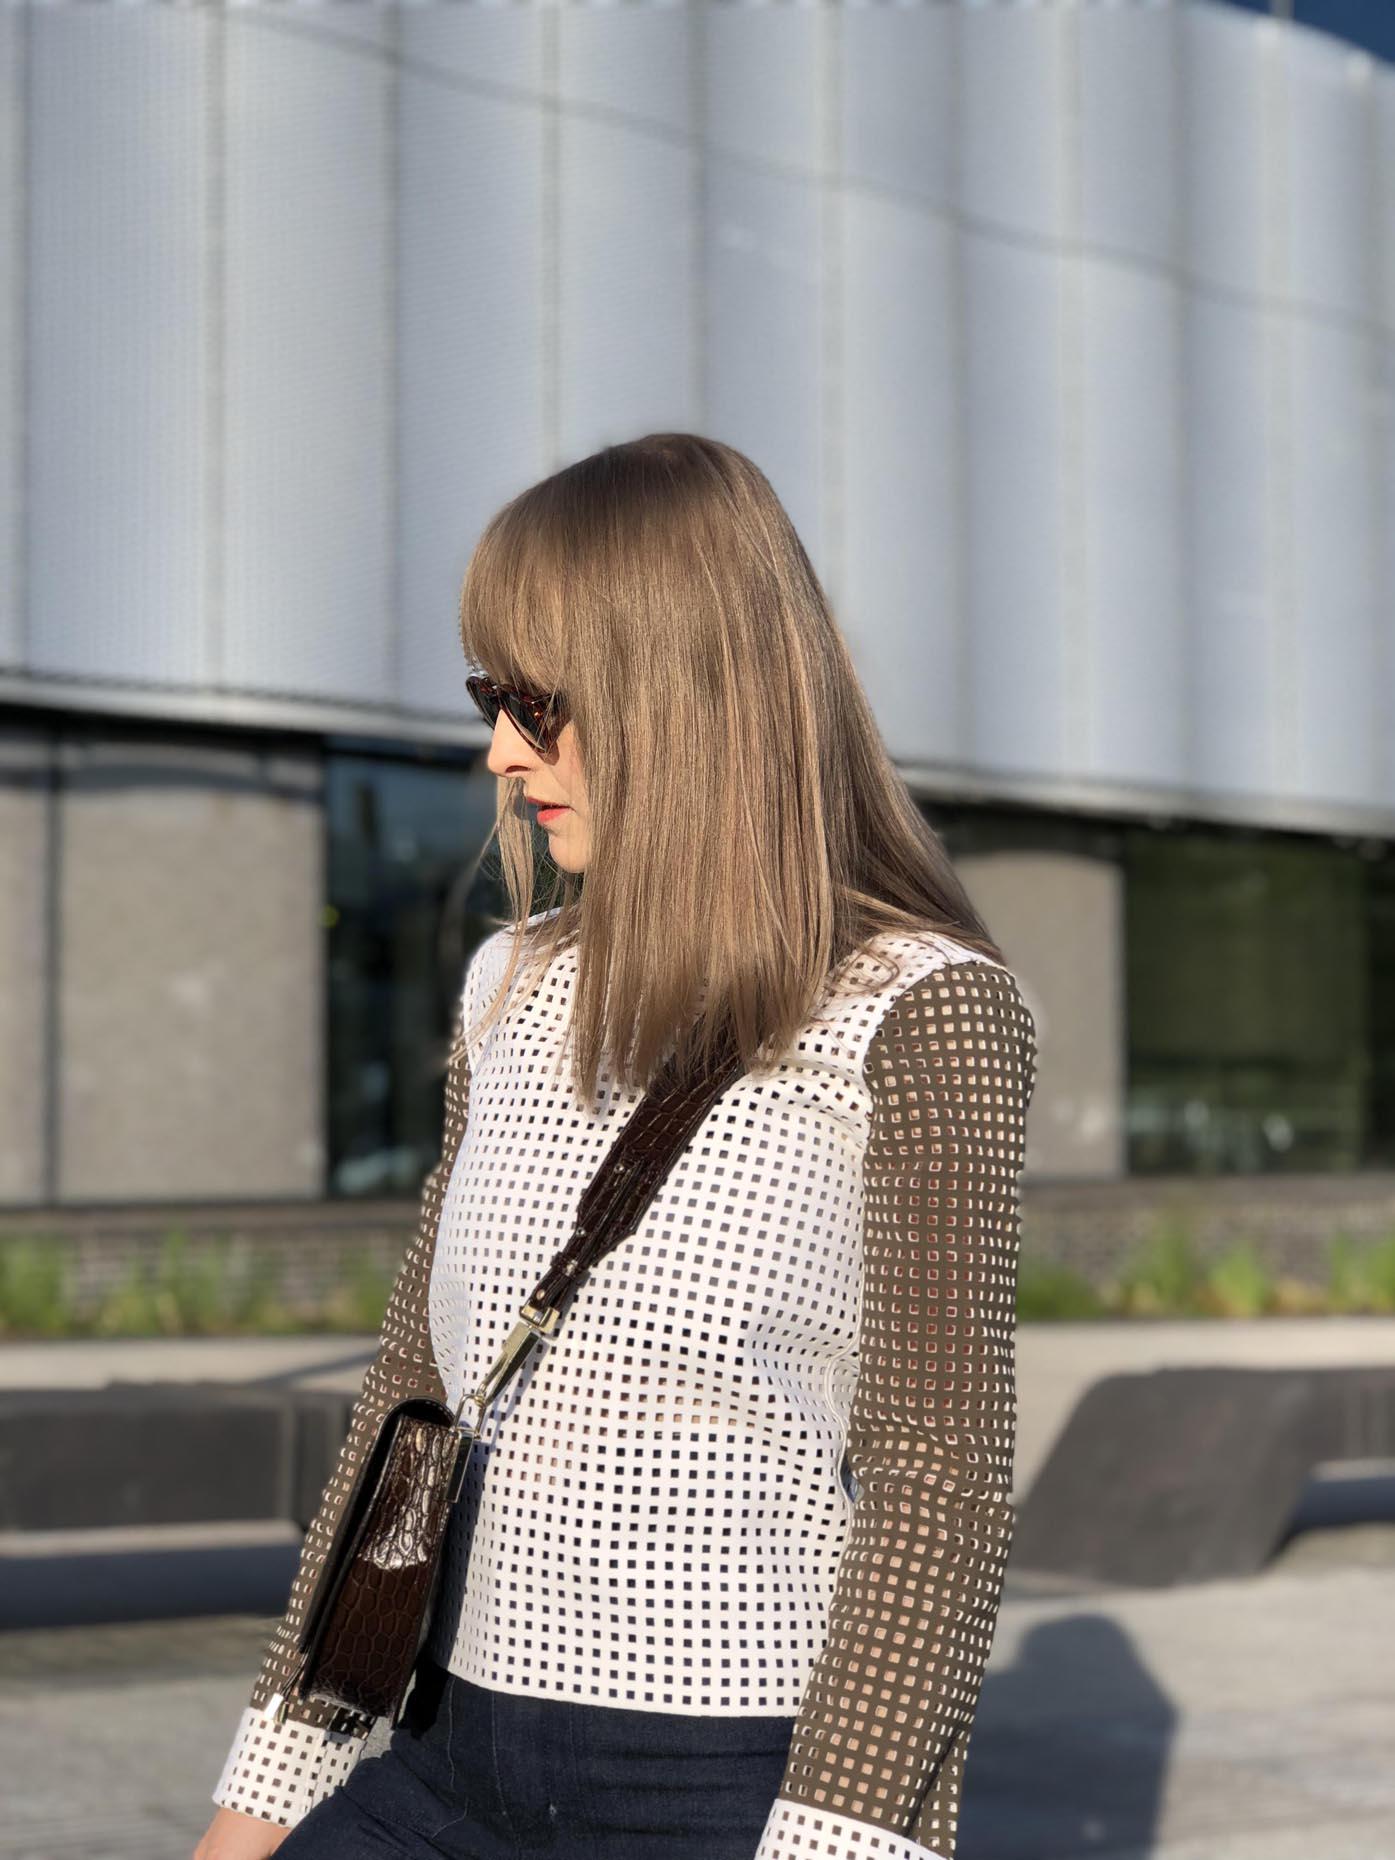 jw anderson, saddle bag zofia chylak, polaroid sunglasses by fashion art media